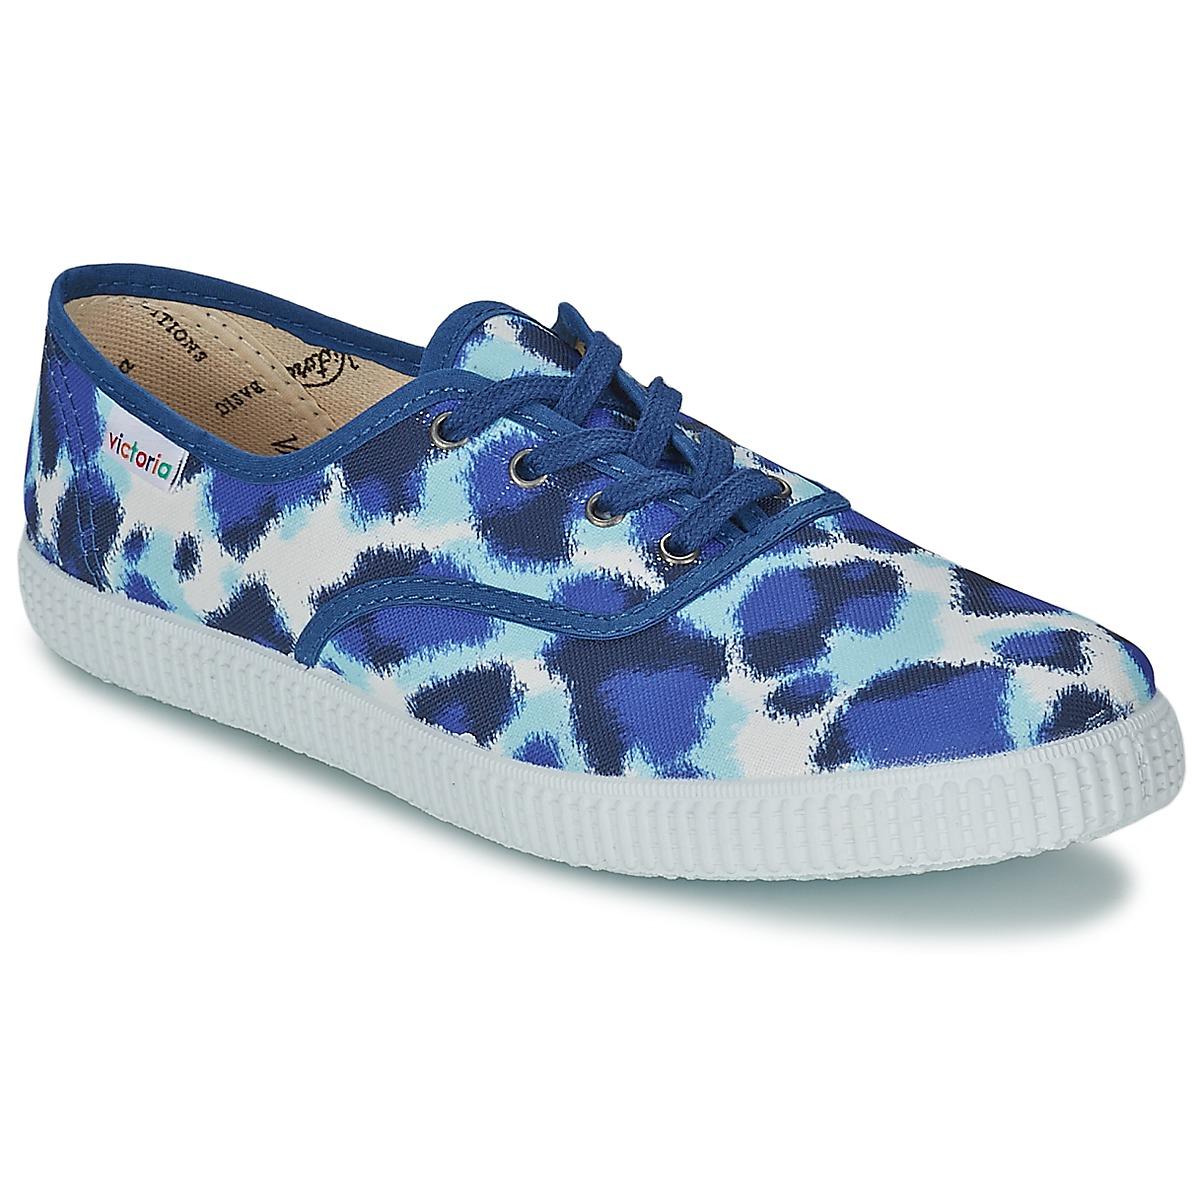 e14f41f22 Victoria INGLESA ESTAMP HUELLA TIGRE Blue Shoes Low top trainers Women  80%OFF